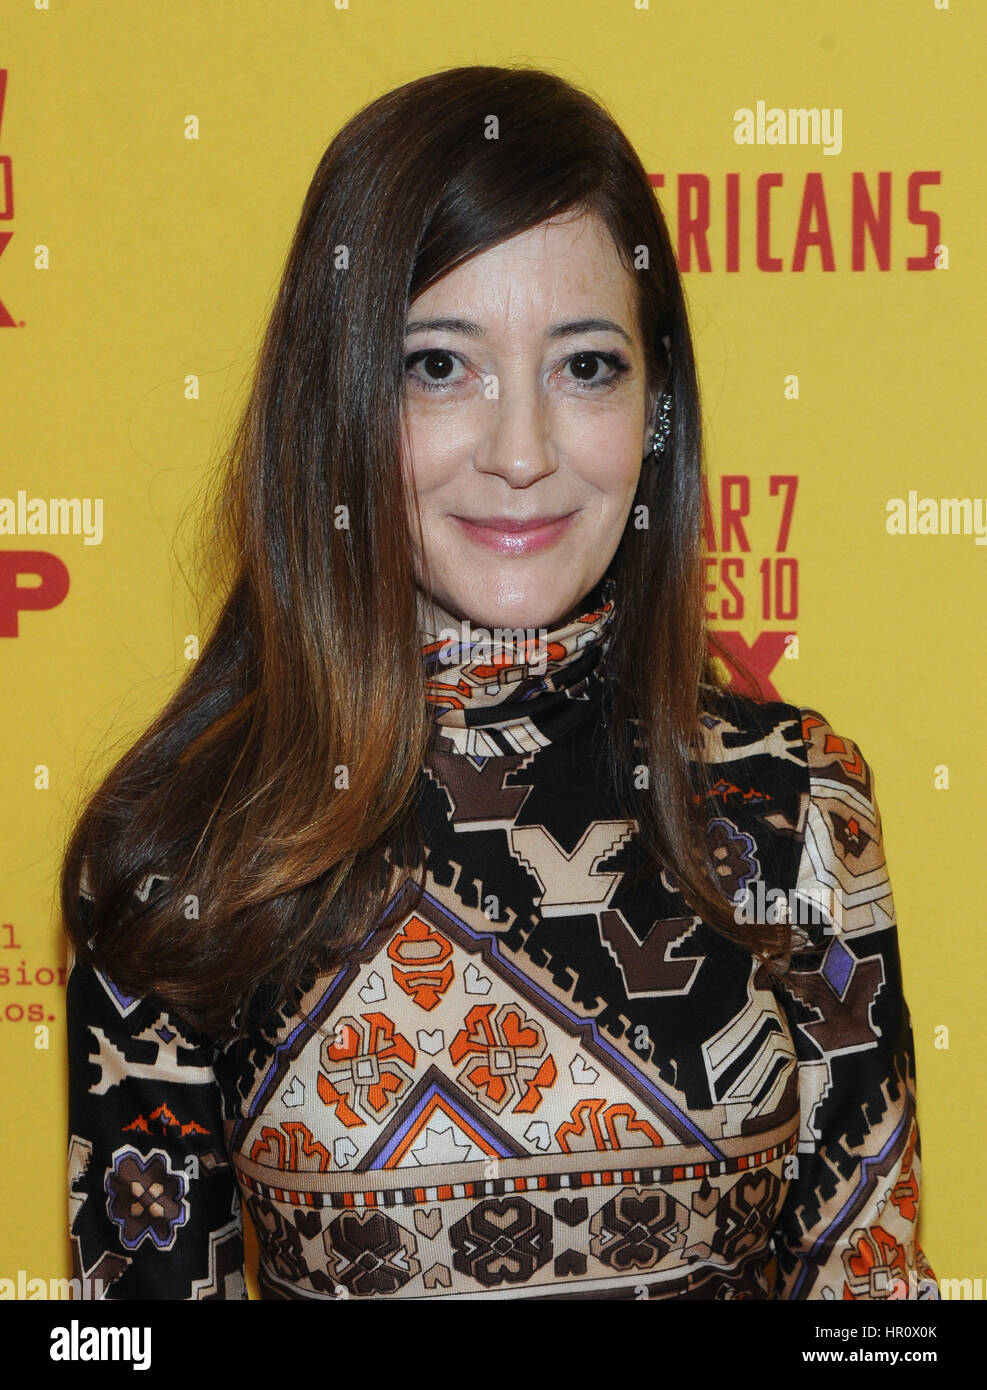 Wafah Dufour,Katherine Heigl born November 24, 1978 (age 39) XXX pics Marlyne Barrett,Sheeri Rappaport